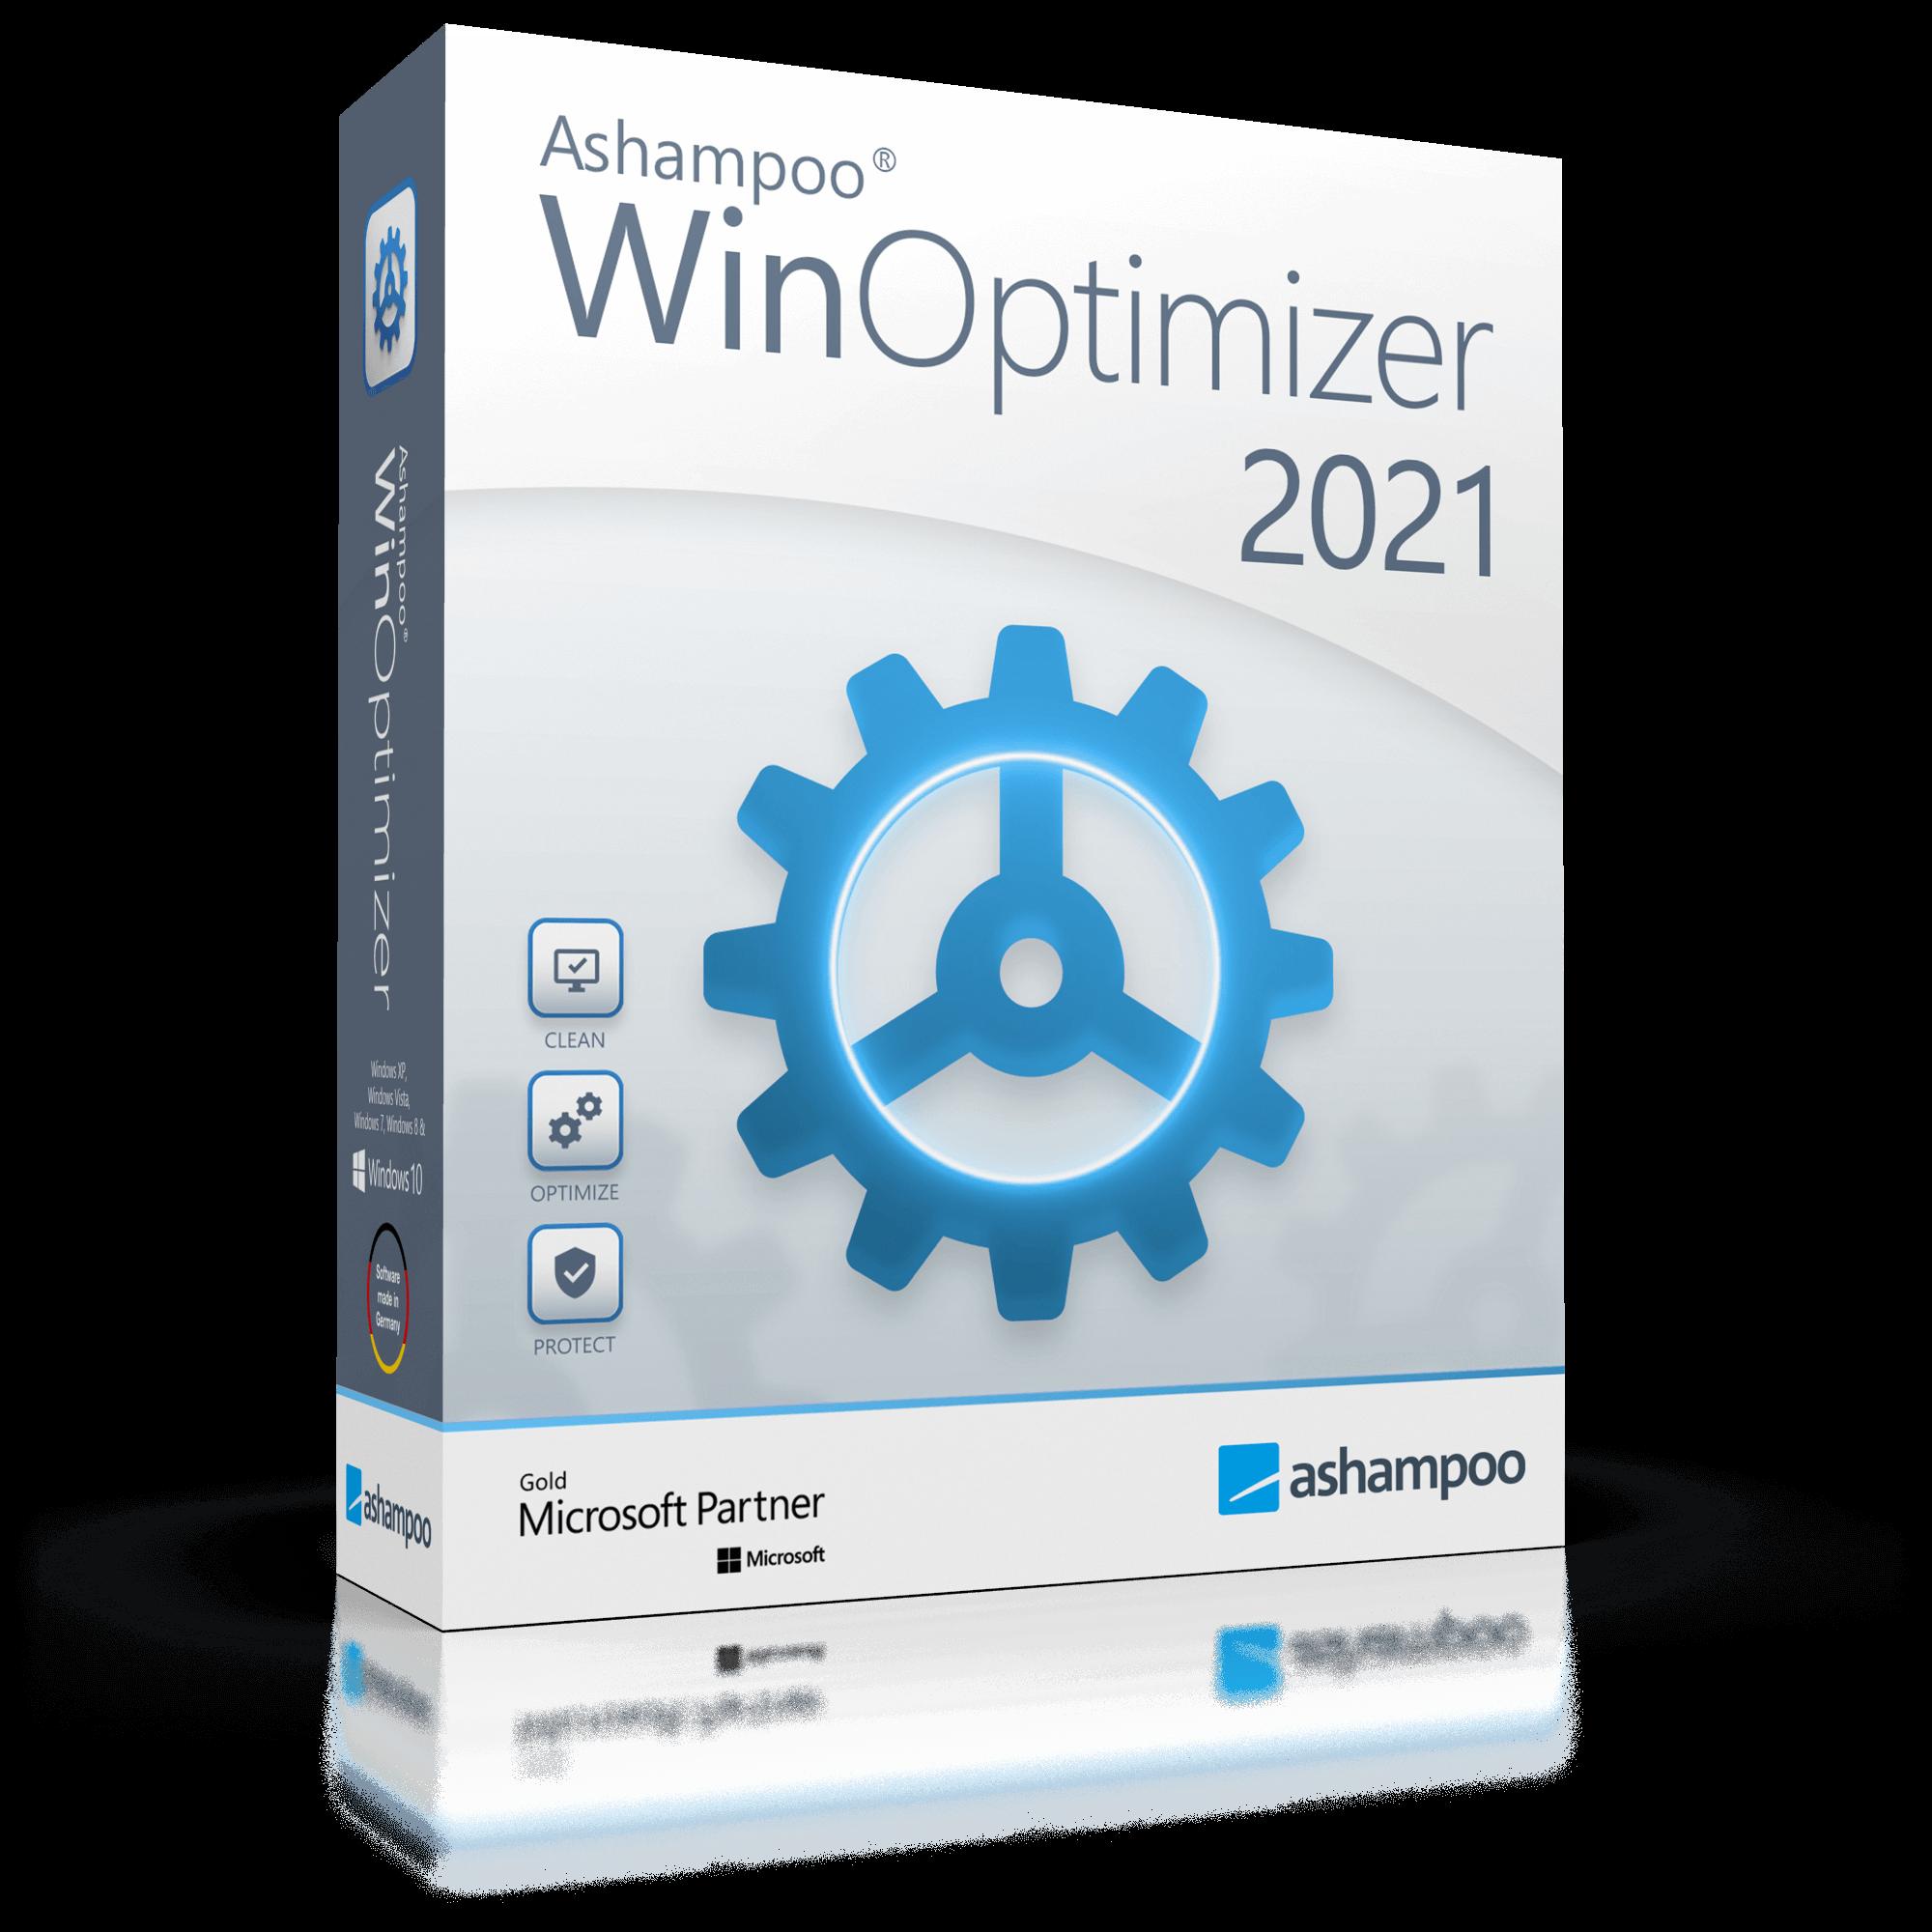 Ashampoo WinOptimizer 2021